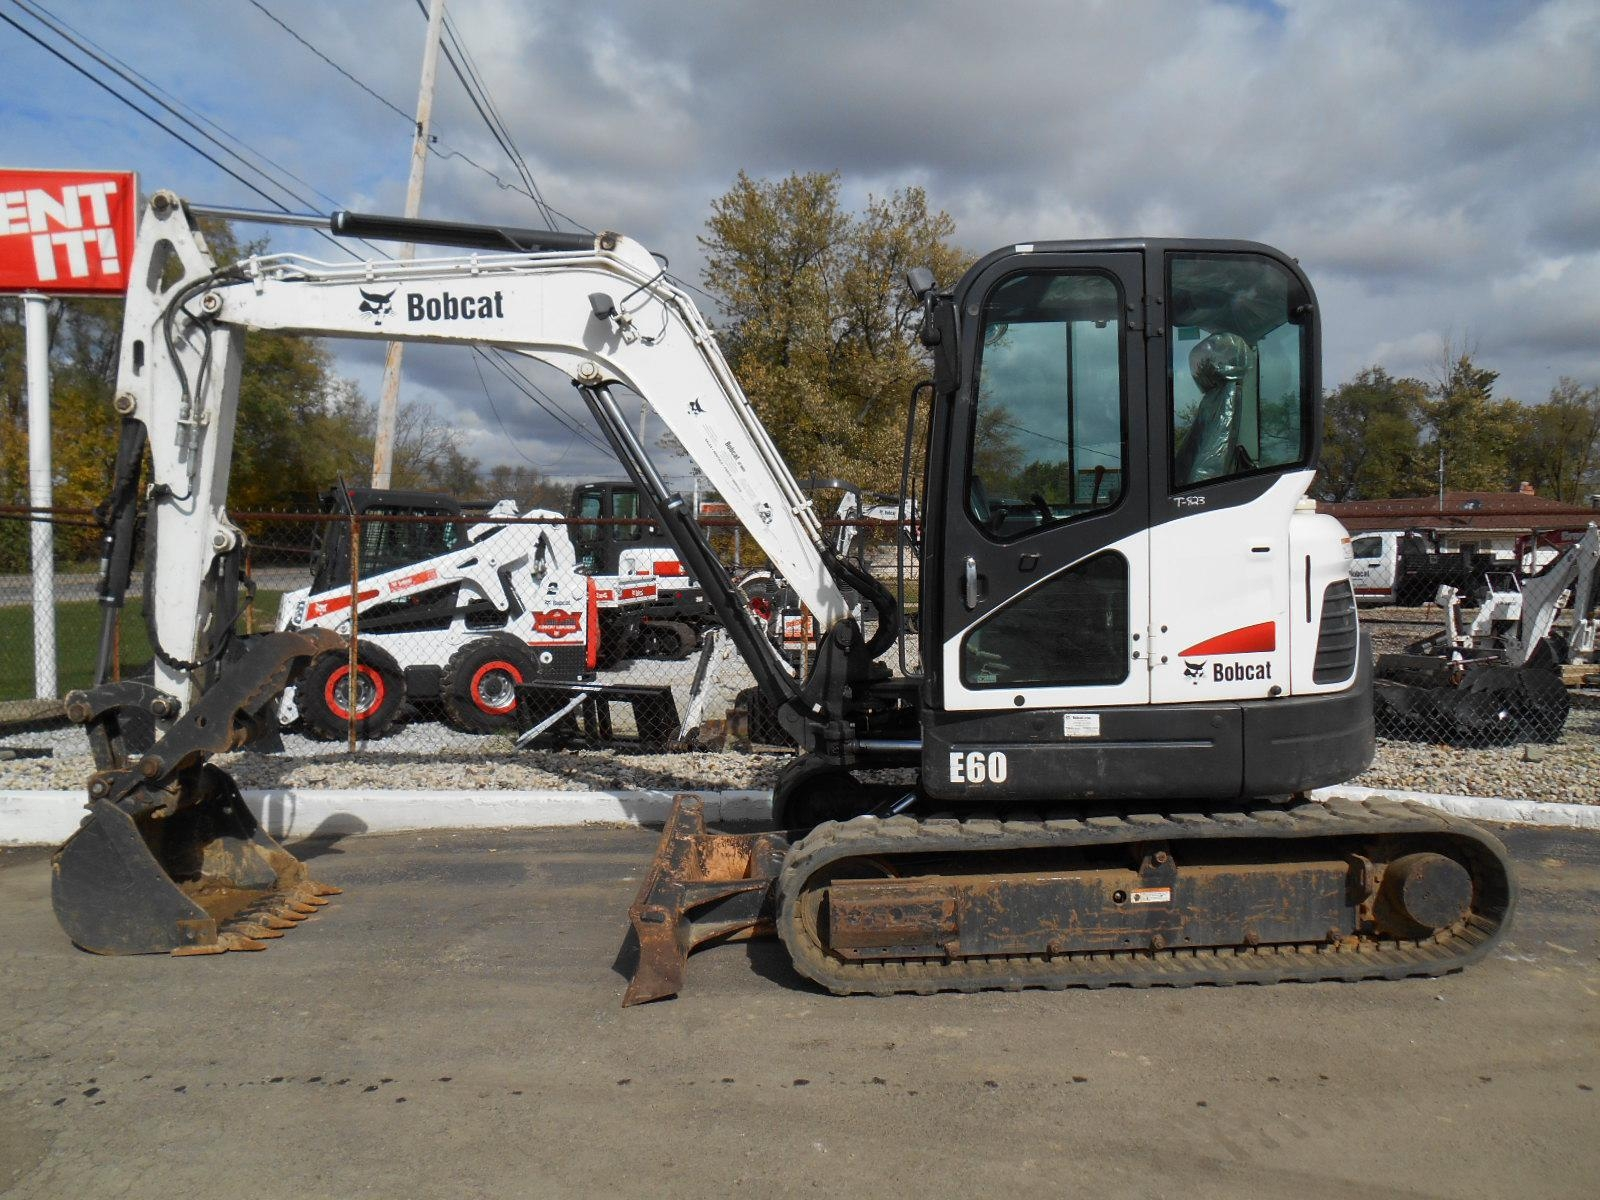 medium resolution of bobcat e60 compact excavator service manual download bobcat excavator e60 wiring diagram